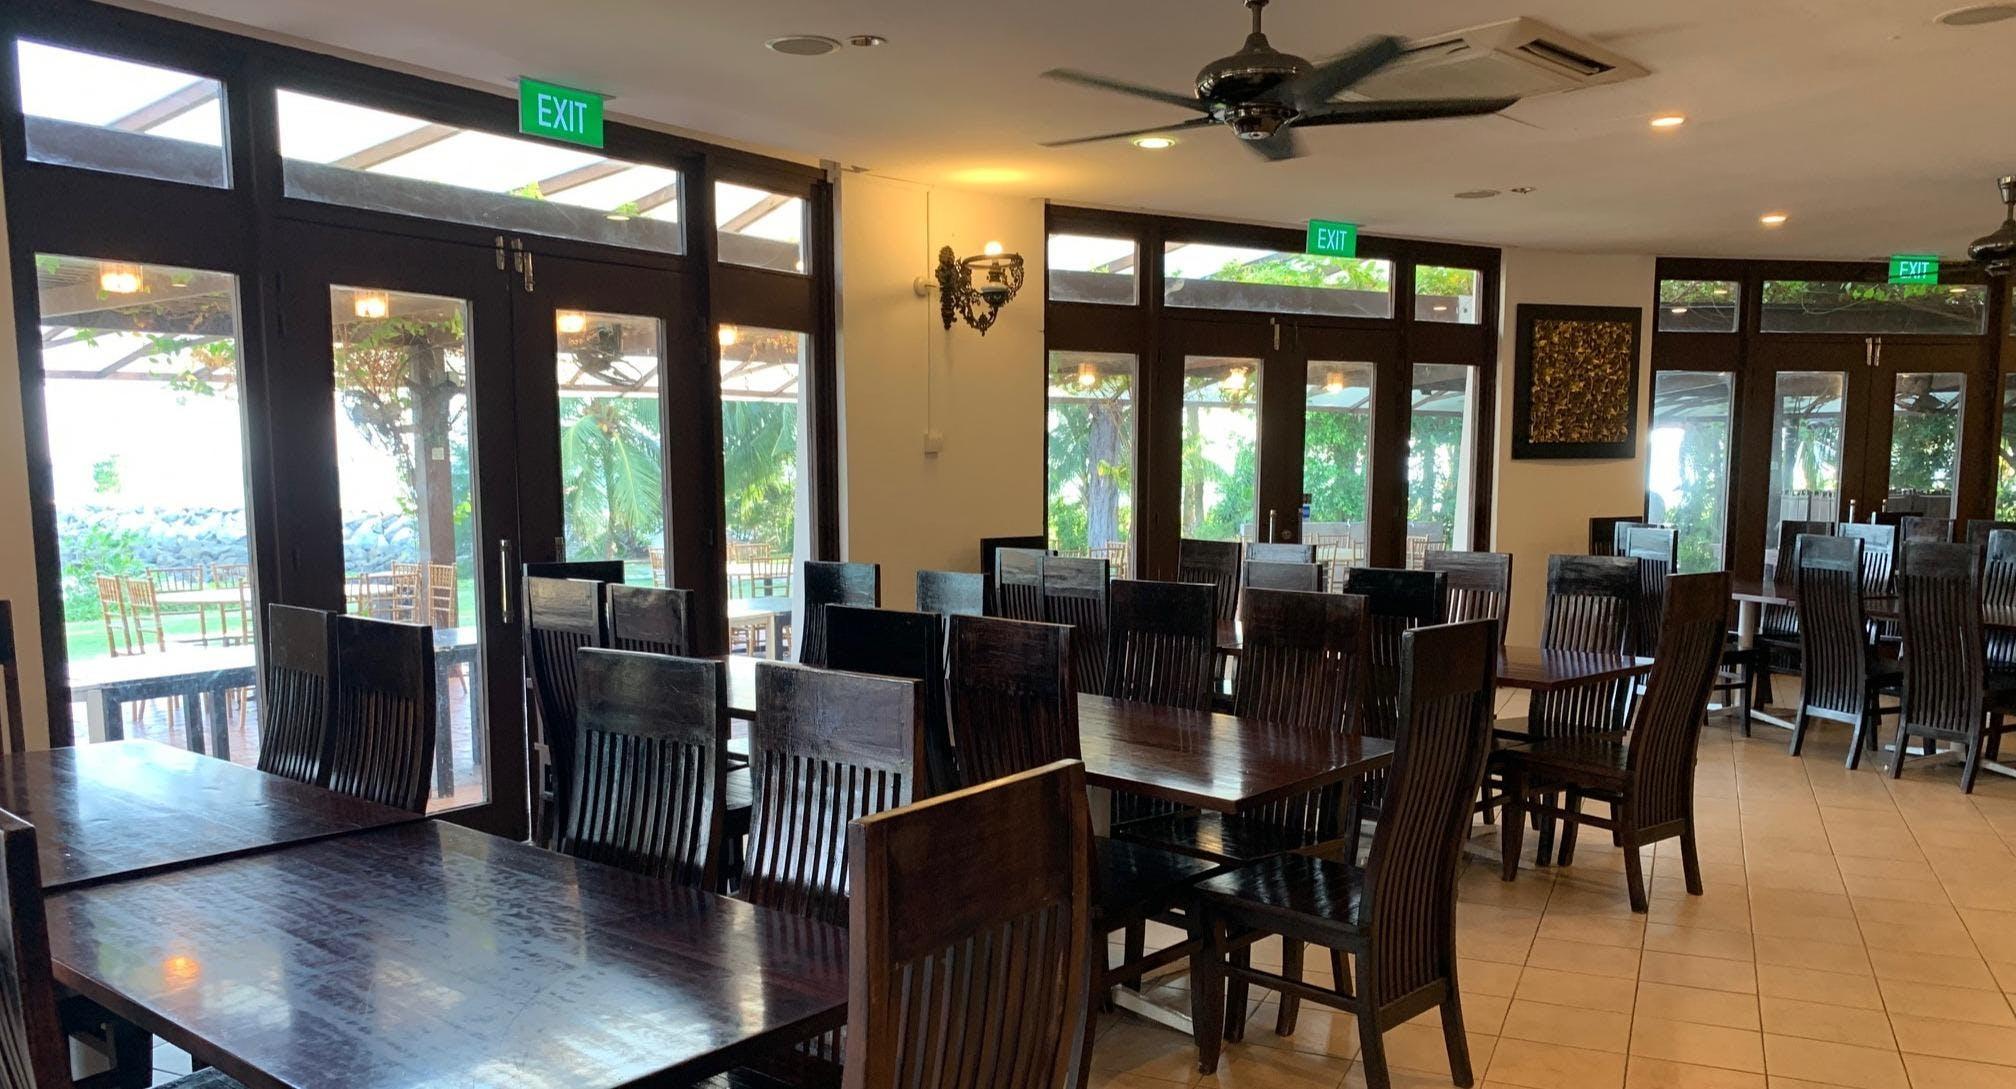 Gurame Indonesian Restaurant Singapore image 3